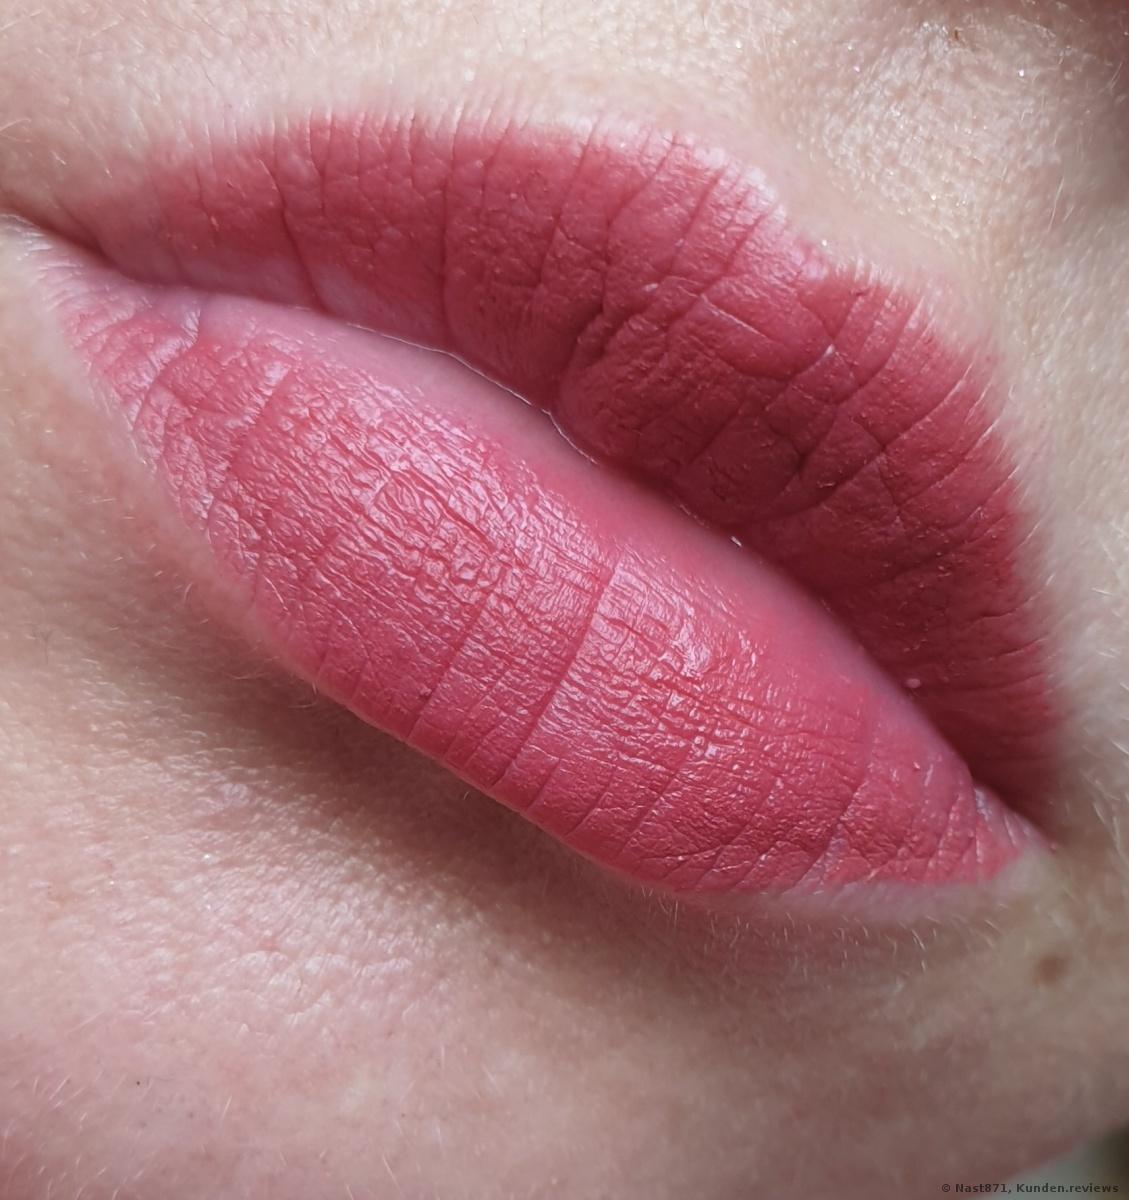 090 GIRLS BITE BACK Generation Matt Comfortable Liquid Lipstick von Catrice